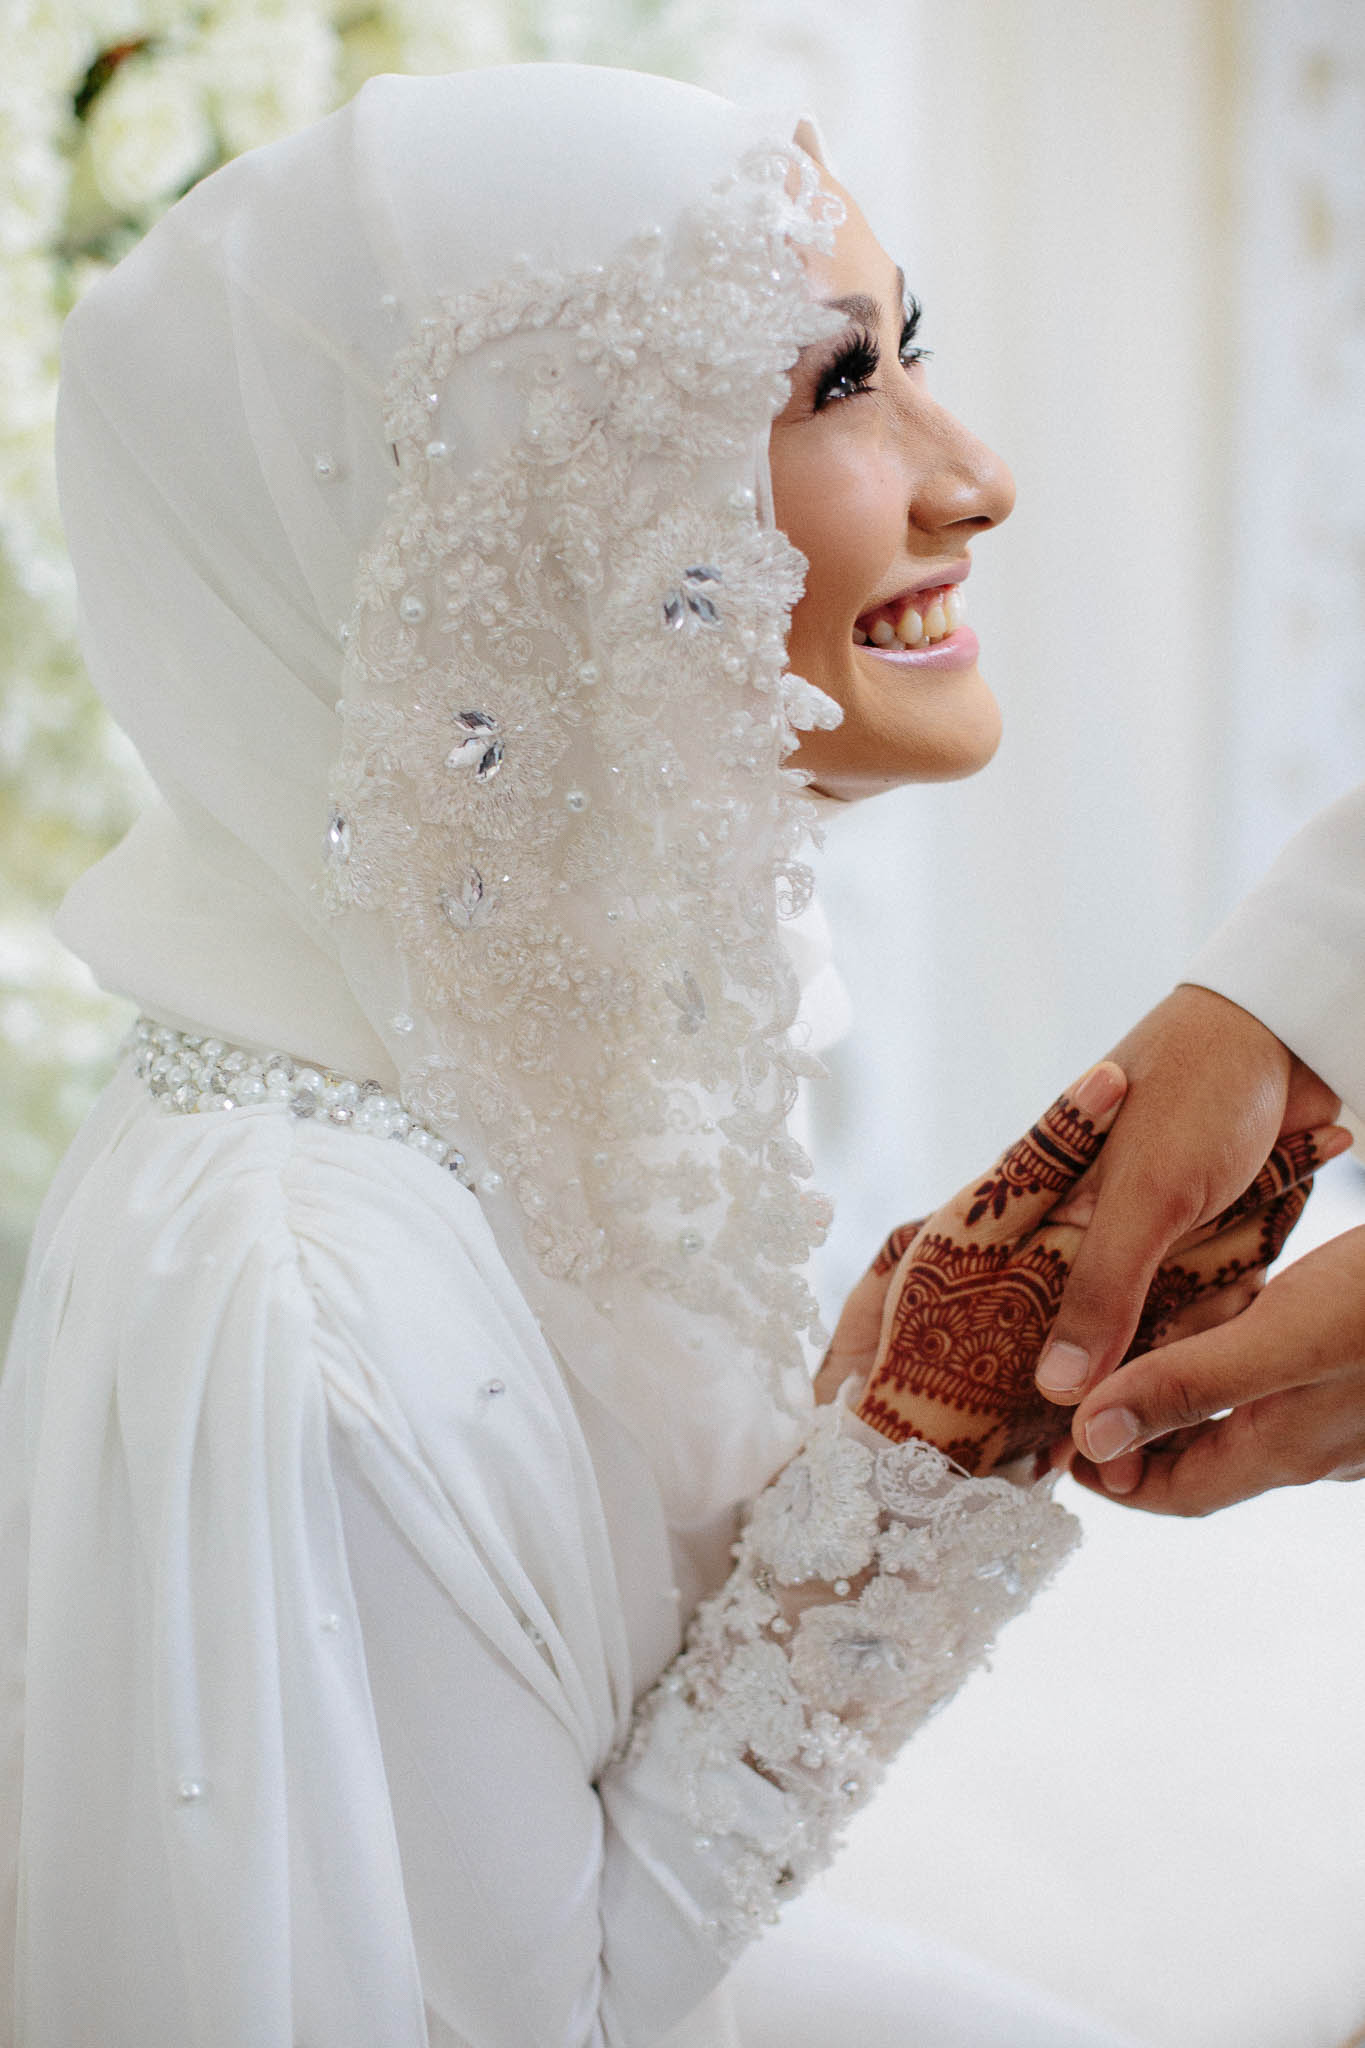 singapore-wedding-photographer-sarah-razif-36.jpg